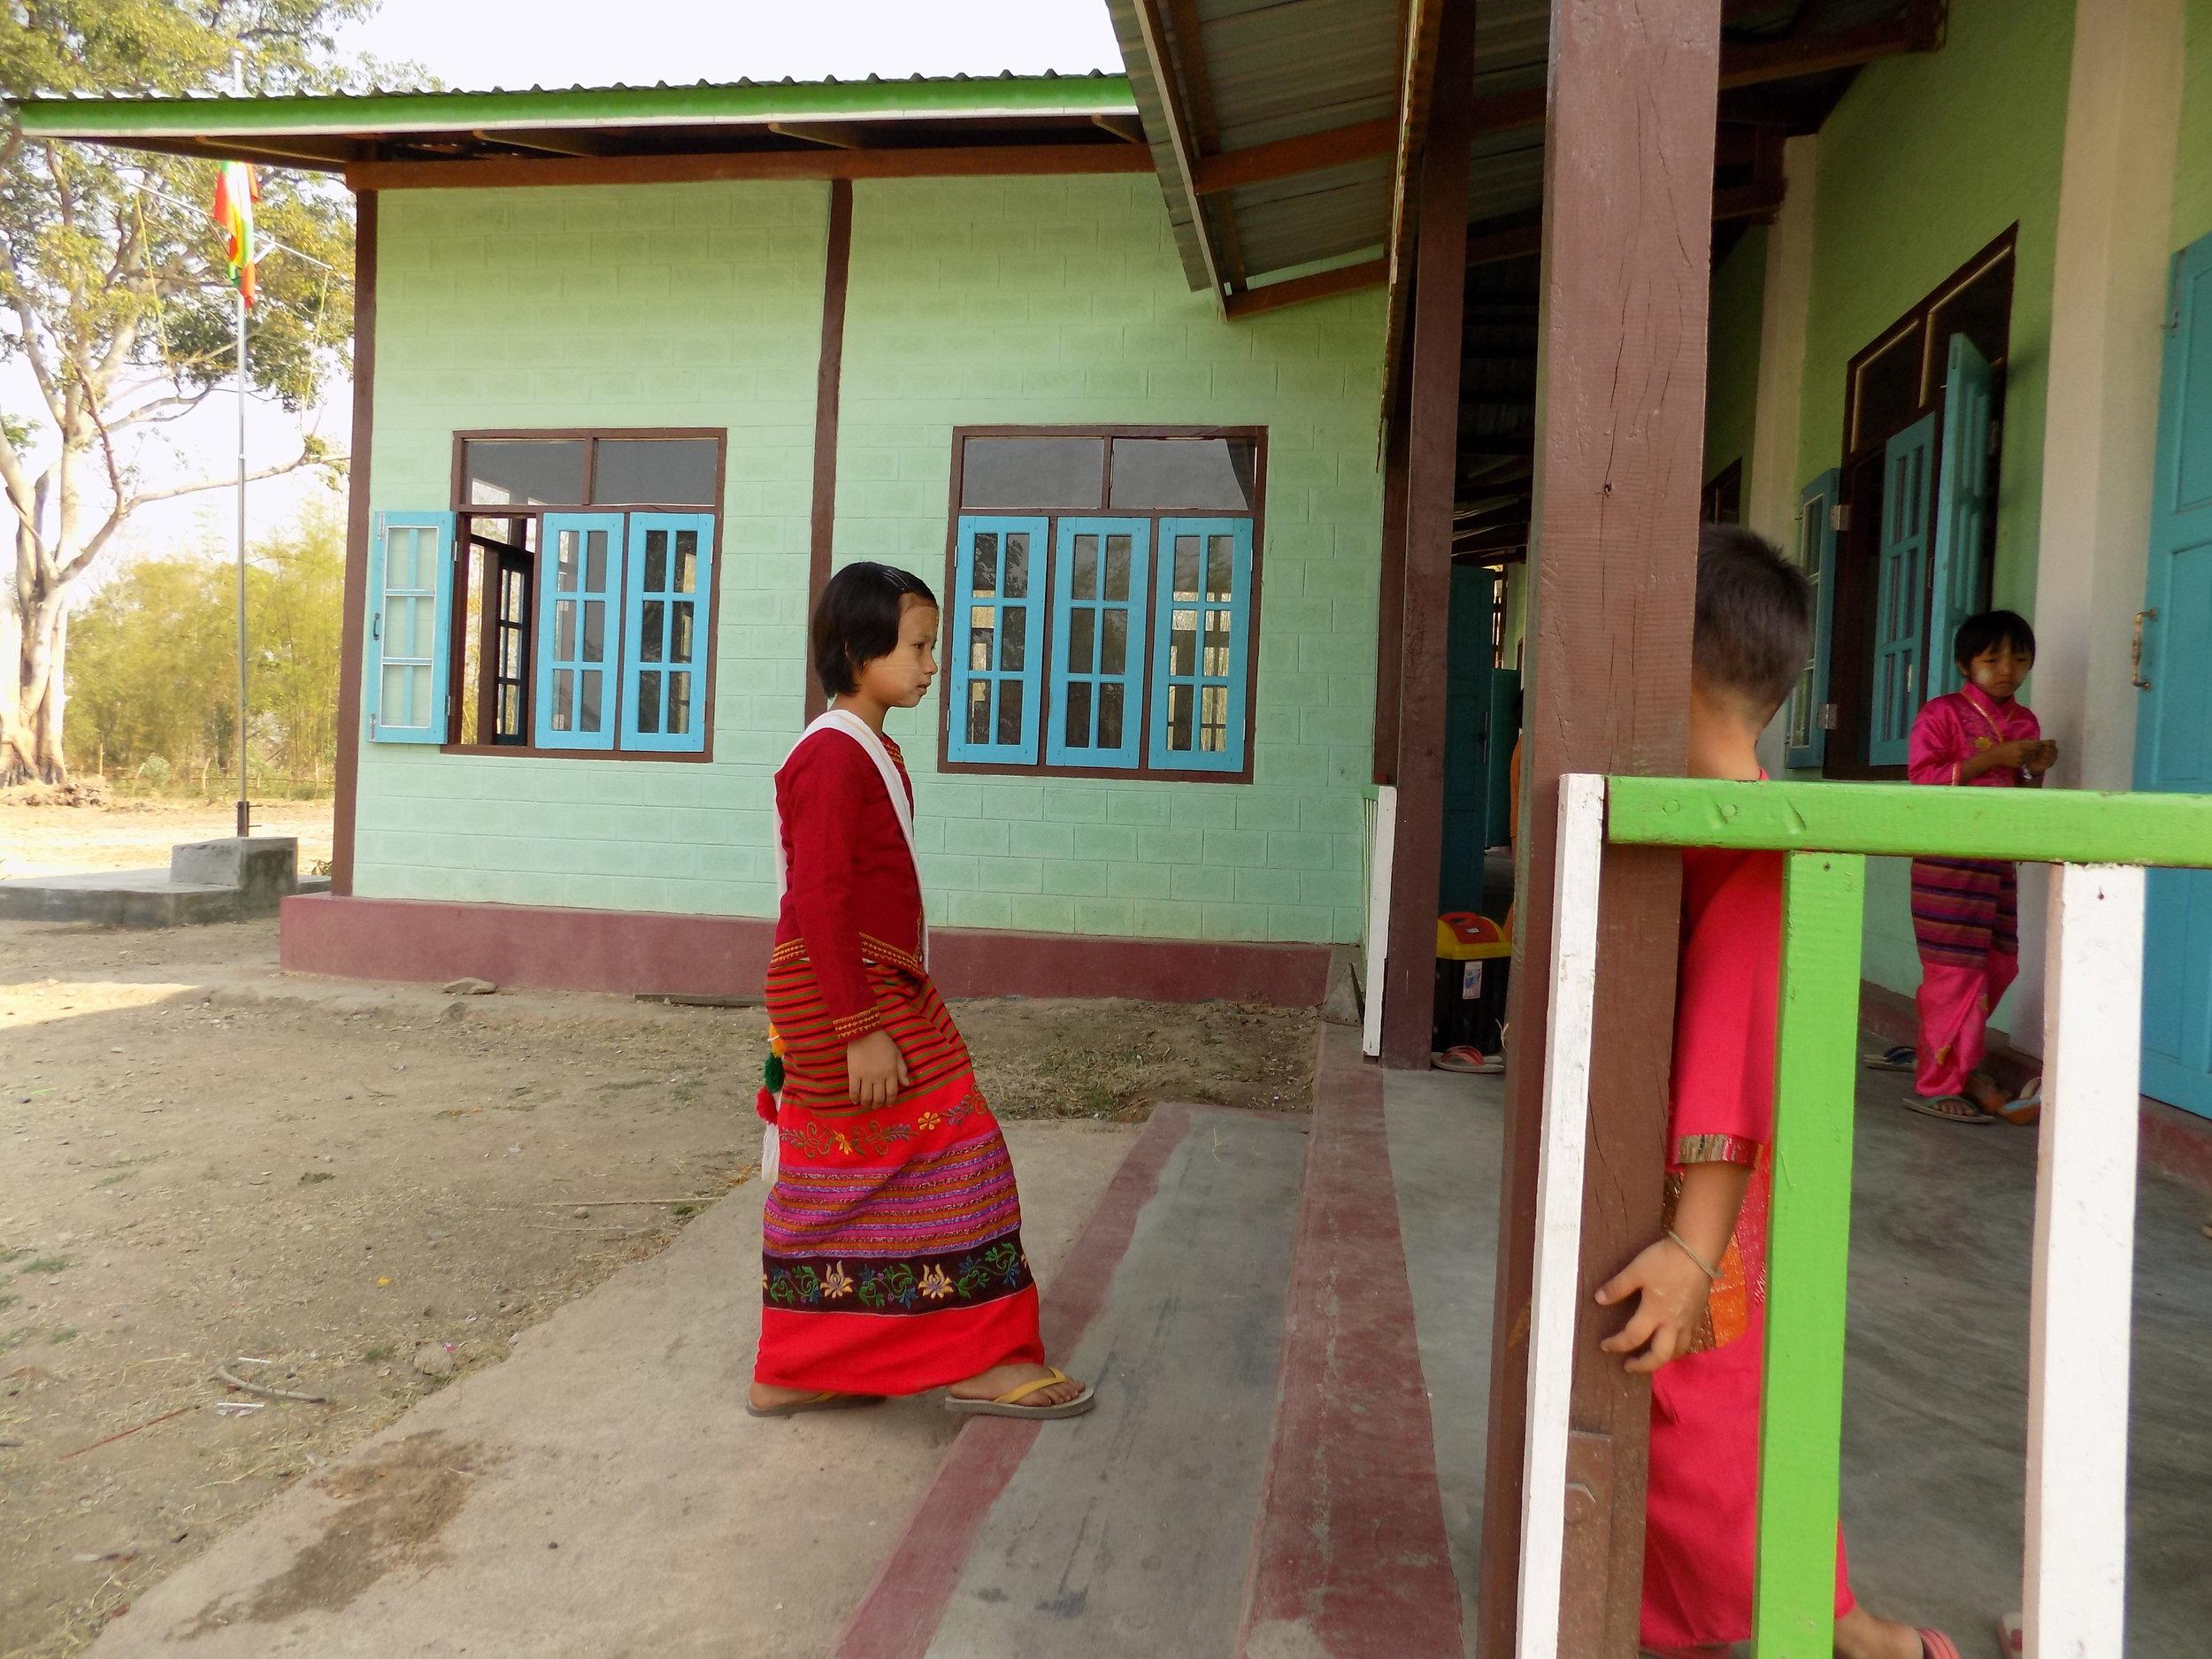 Nung Lao Ngun walks to school.